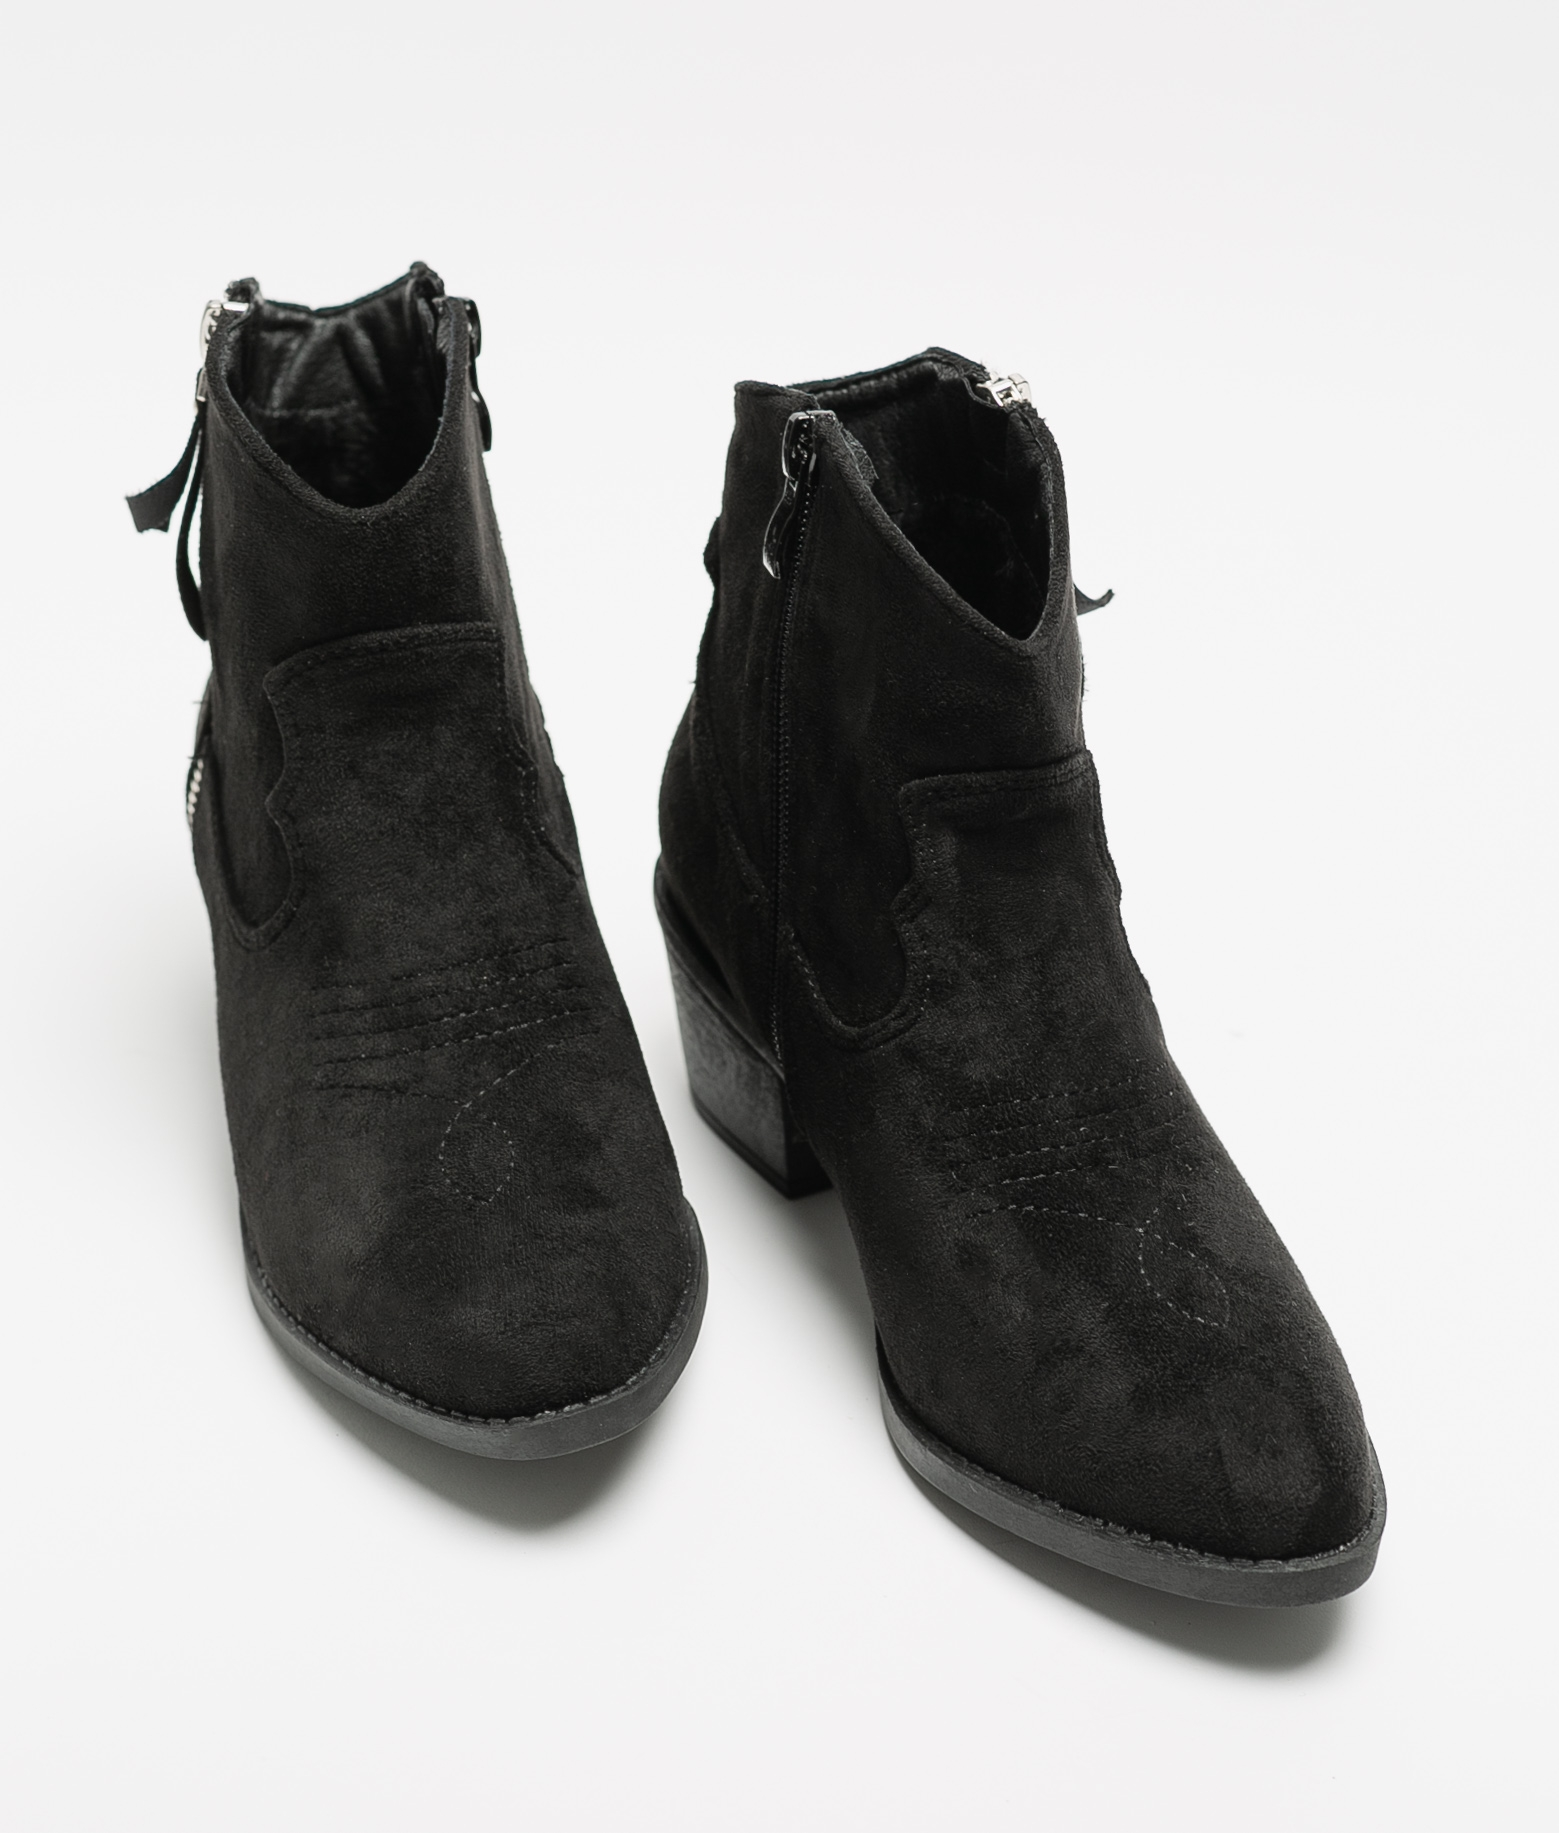 Low Boot Sule - Black